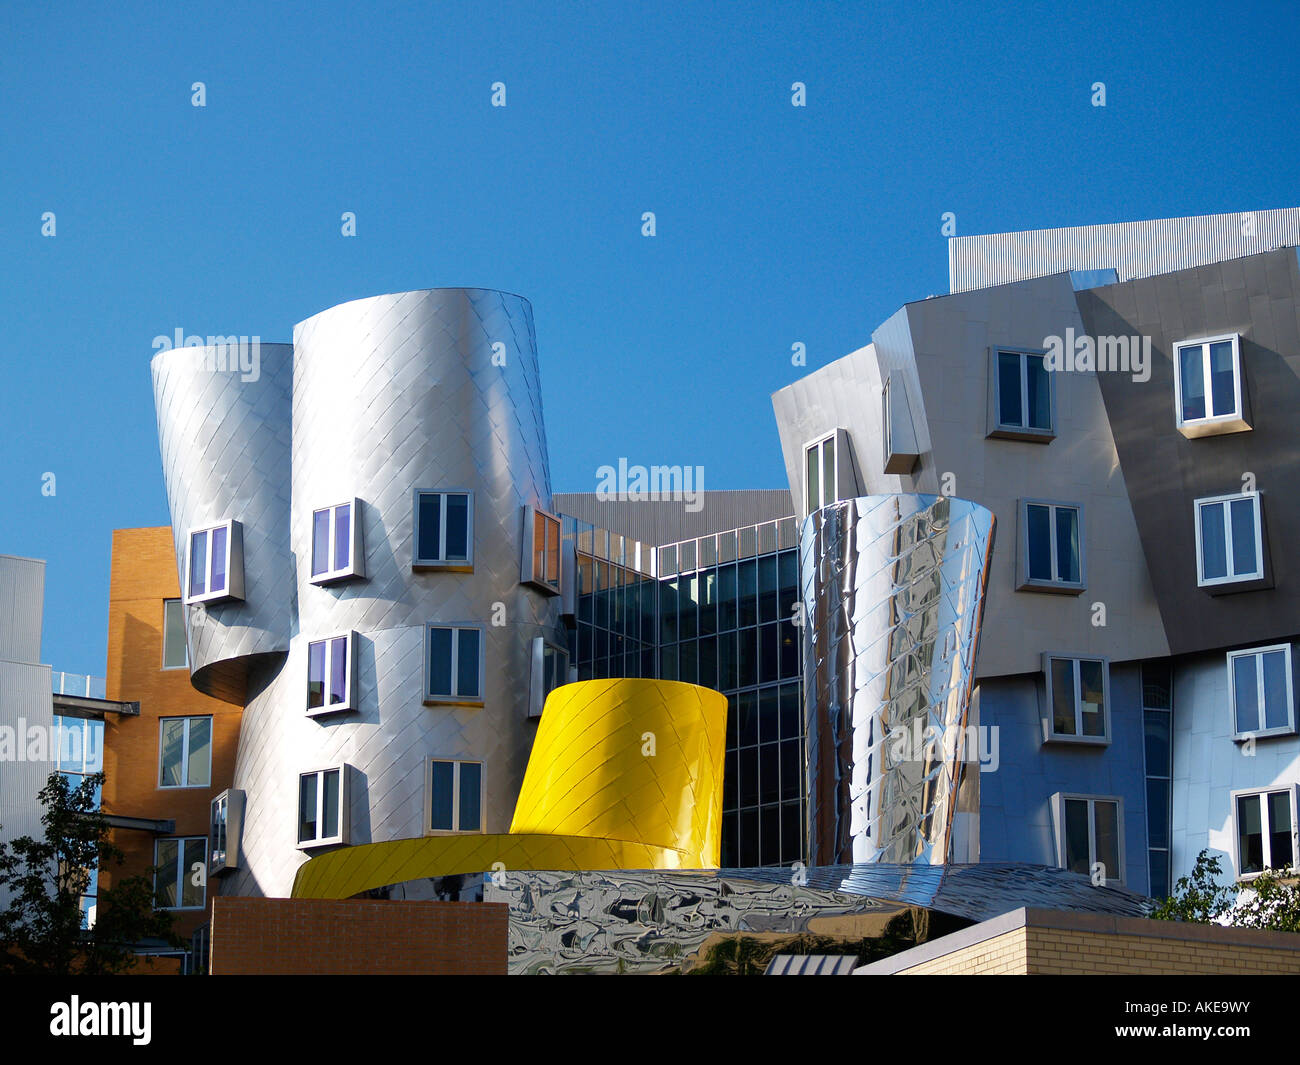 The Stata Center Architect Frank Gehry Massachusetts Institute of Technology Cambridge Massachusetts USA - Stock Image